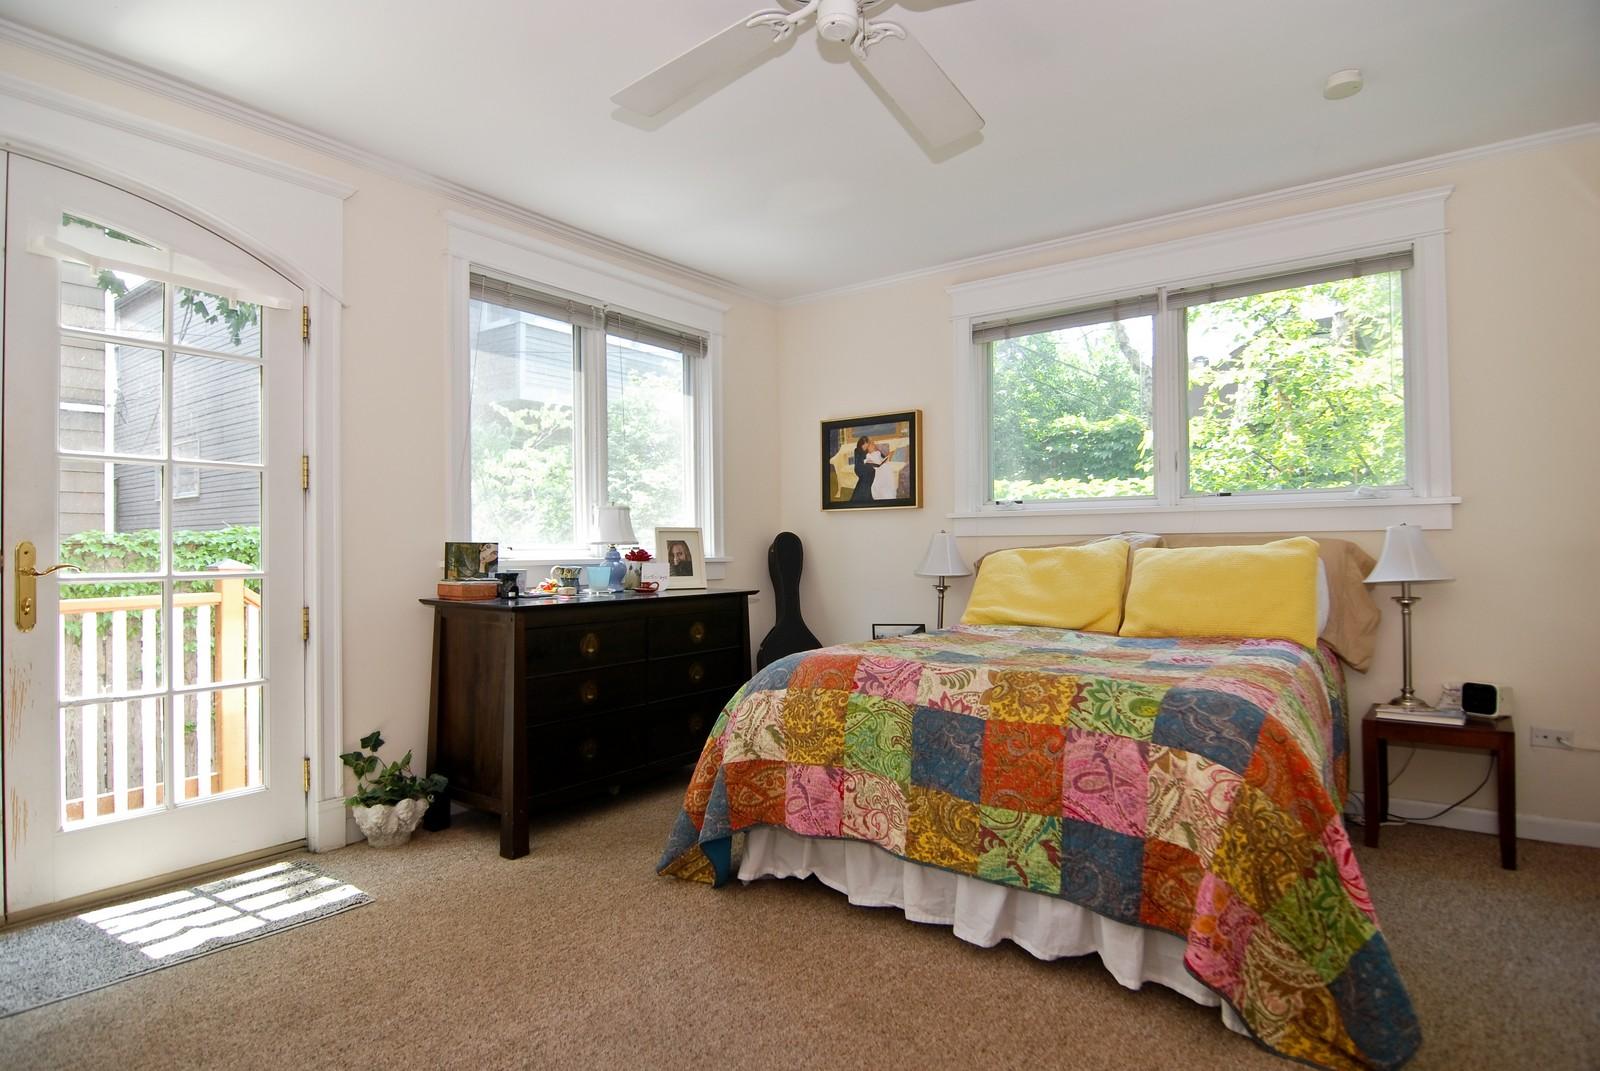 Real Estate Photography - 343 W Menomonee, Chicago, IL, 60614 - Bedroom